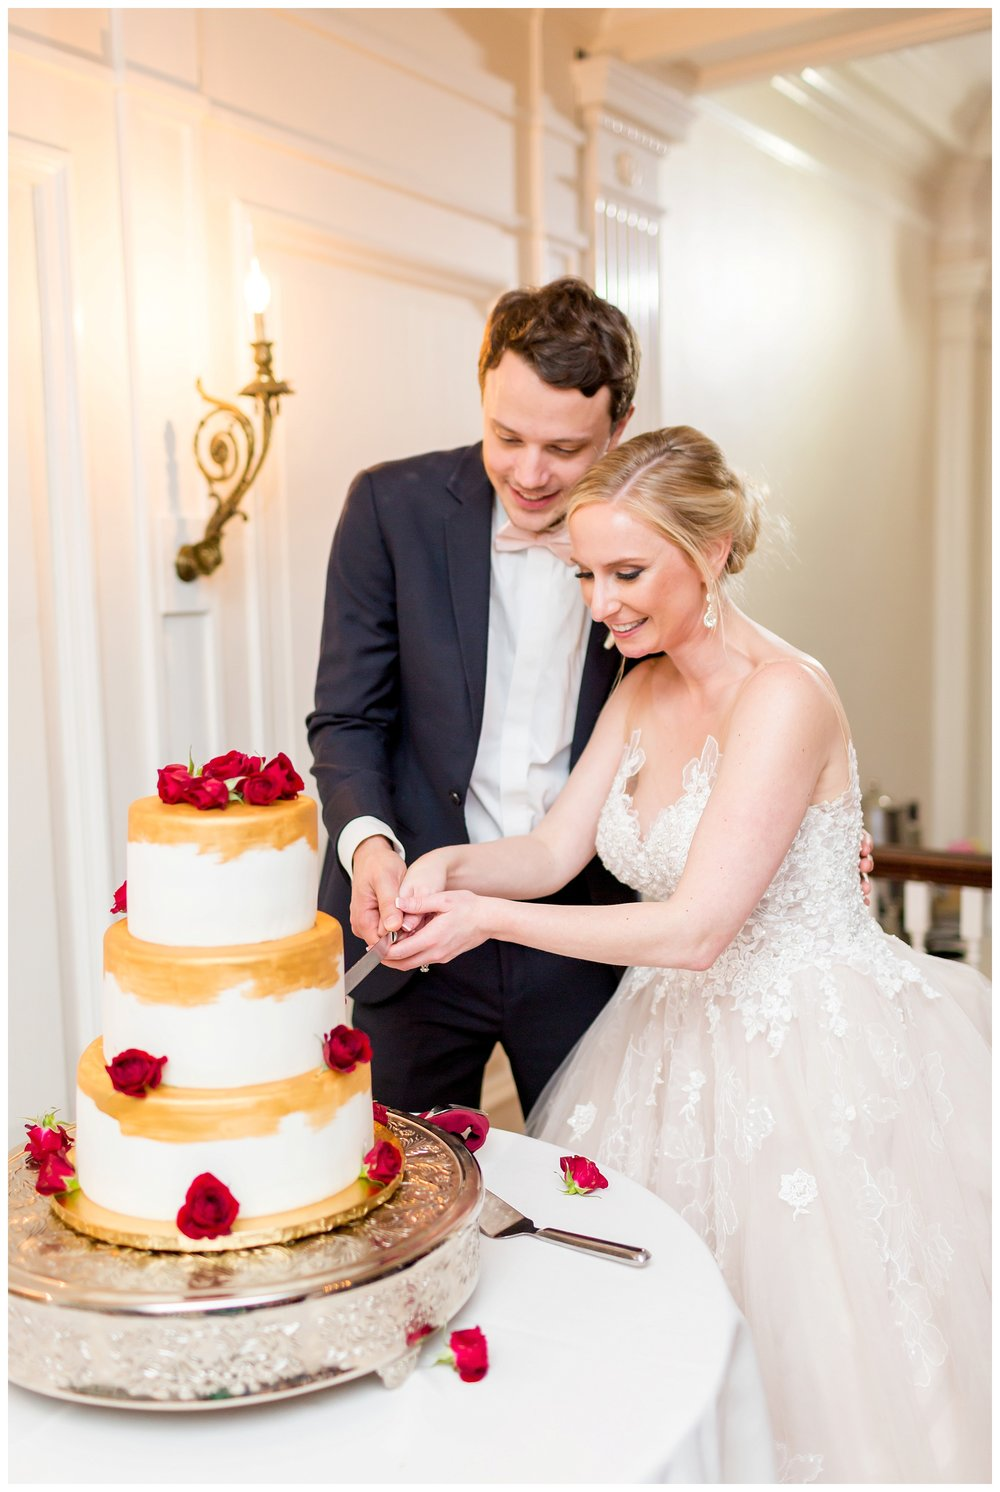 Whitehall Estate Wedding | Northern Virginia Wedding Photographer Kir Tuben_0123.jpg